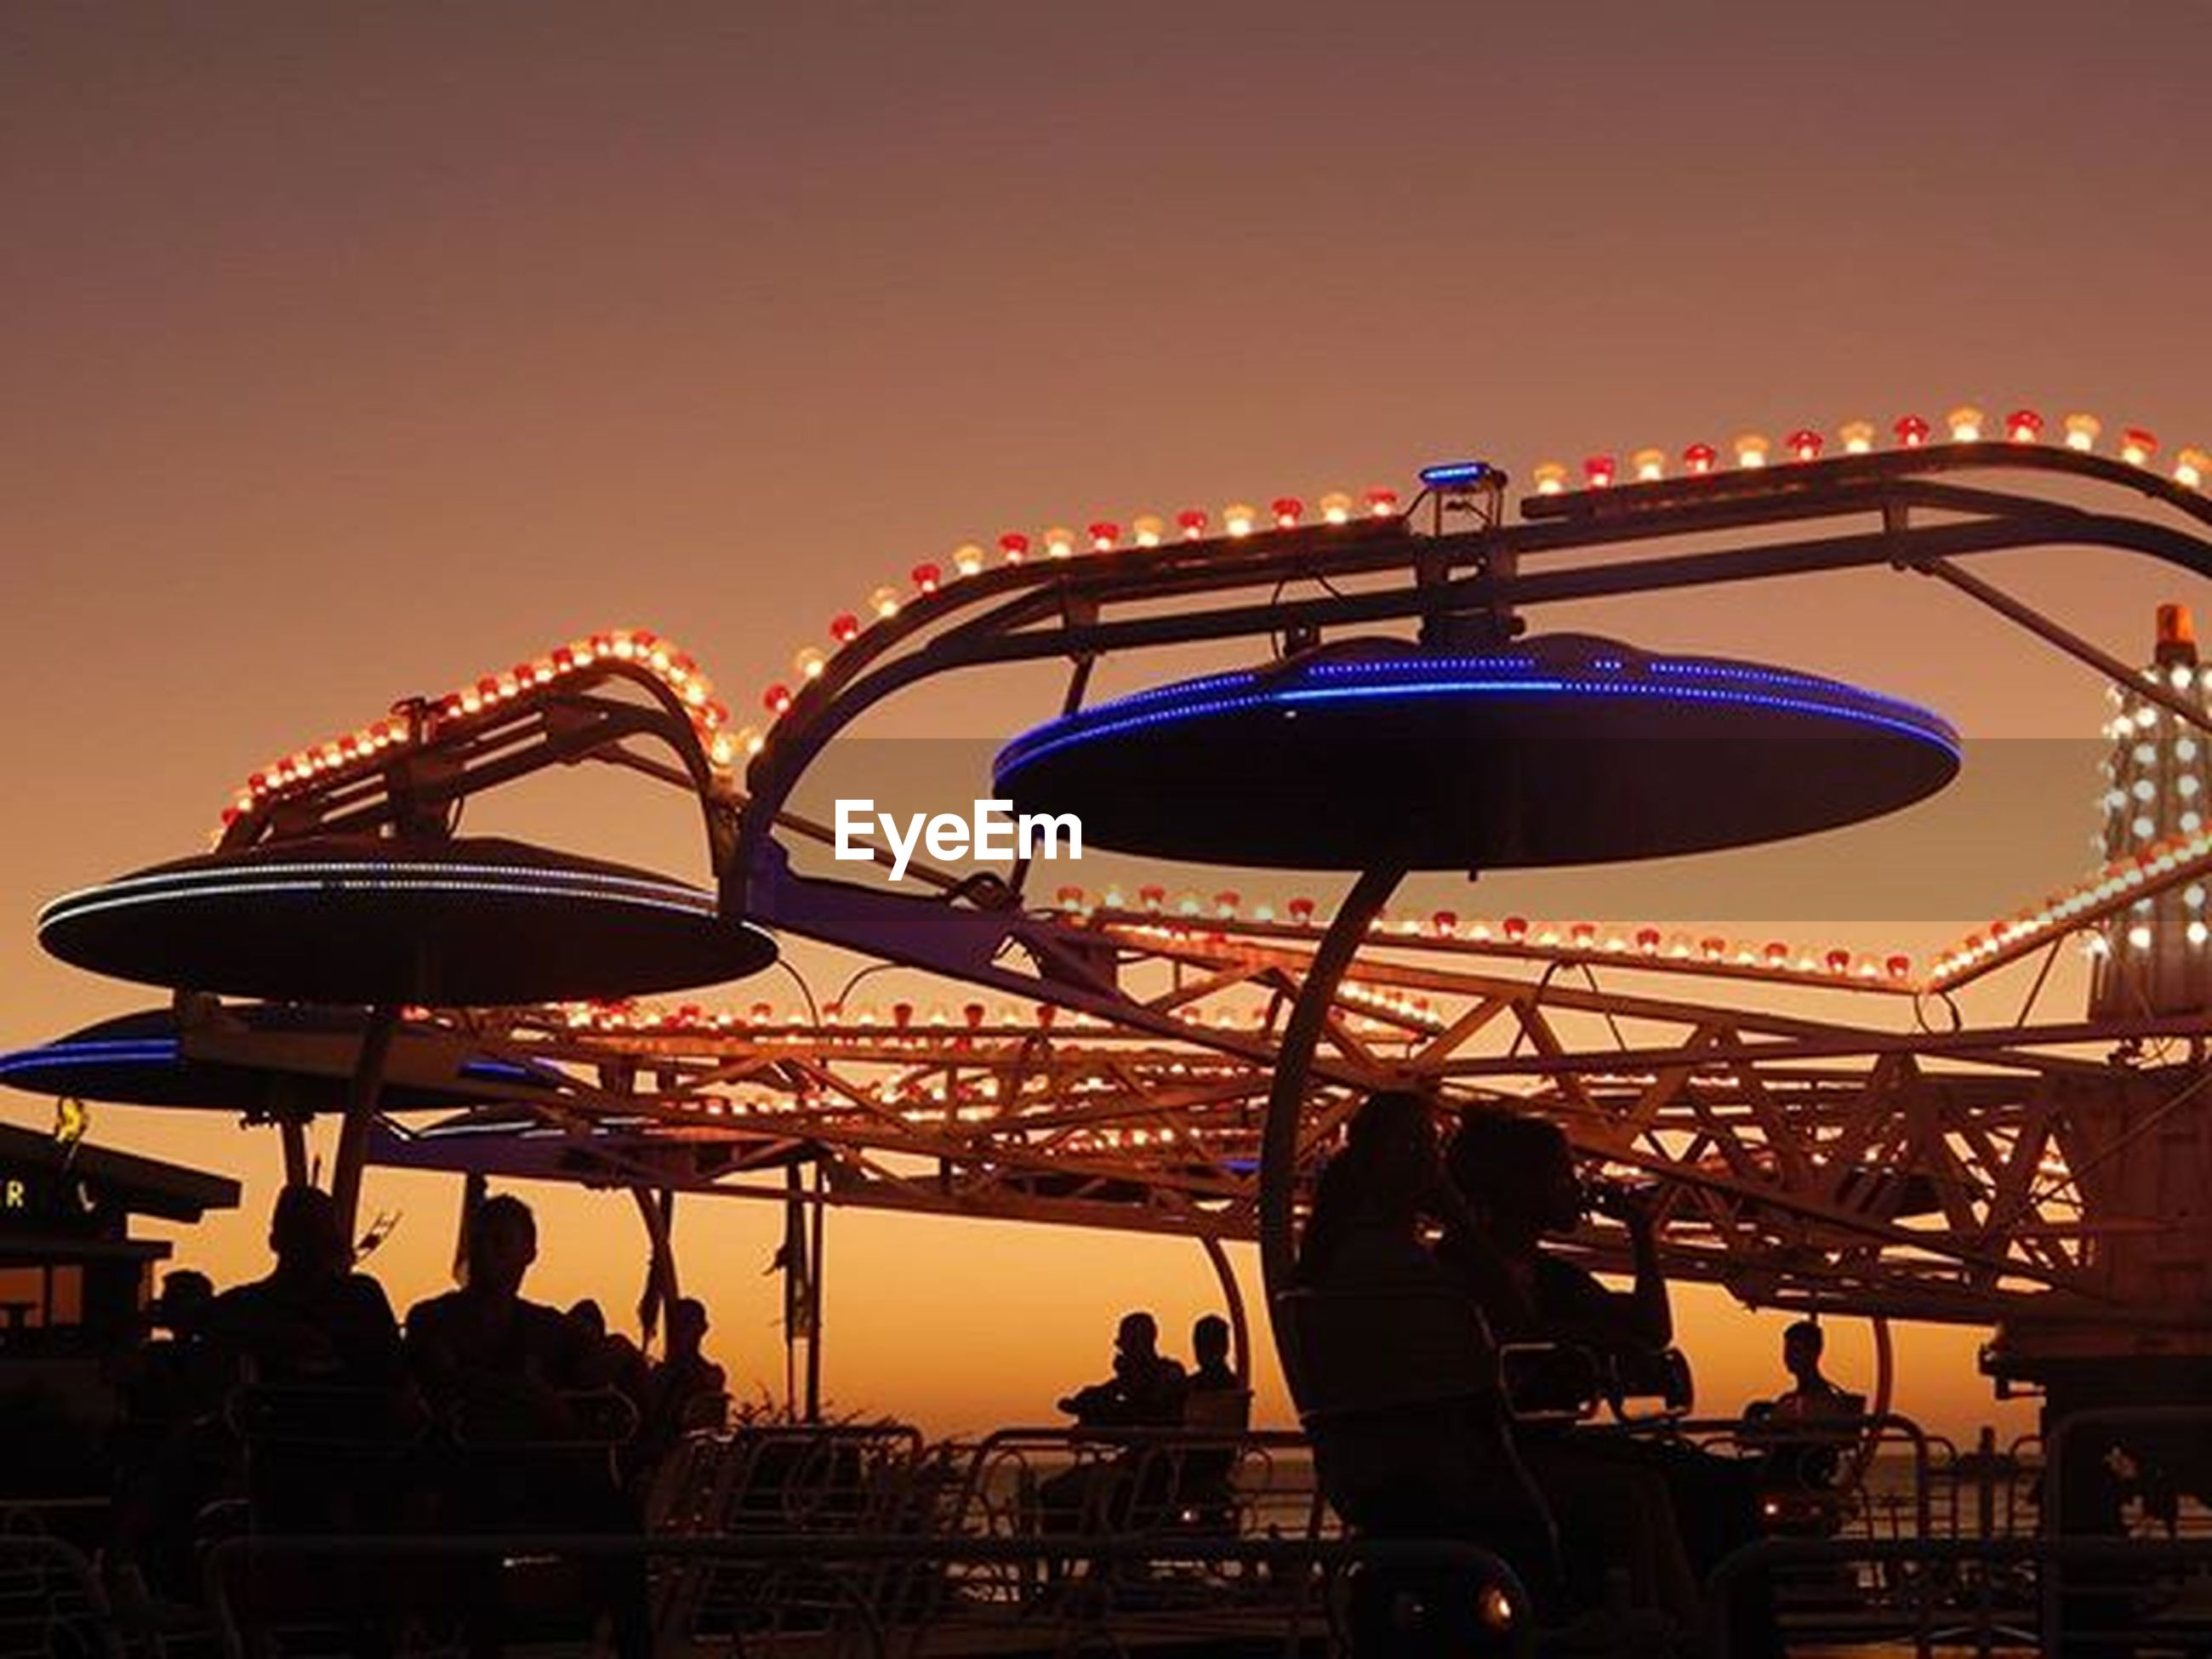 amusement park, amusement park ride, arts culture and entertainment, ferris wheel, illuminated, sky, low angle view, built structure, silhouette, architecture, clear sky, sunset, dusk, lighting equipment, copy space, leisure activity, tourism, travel destinations, large group of people, night